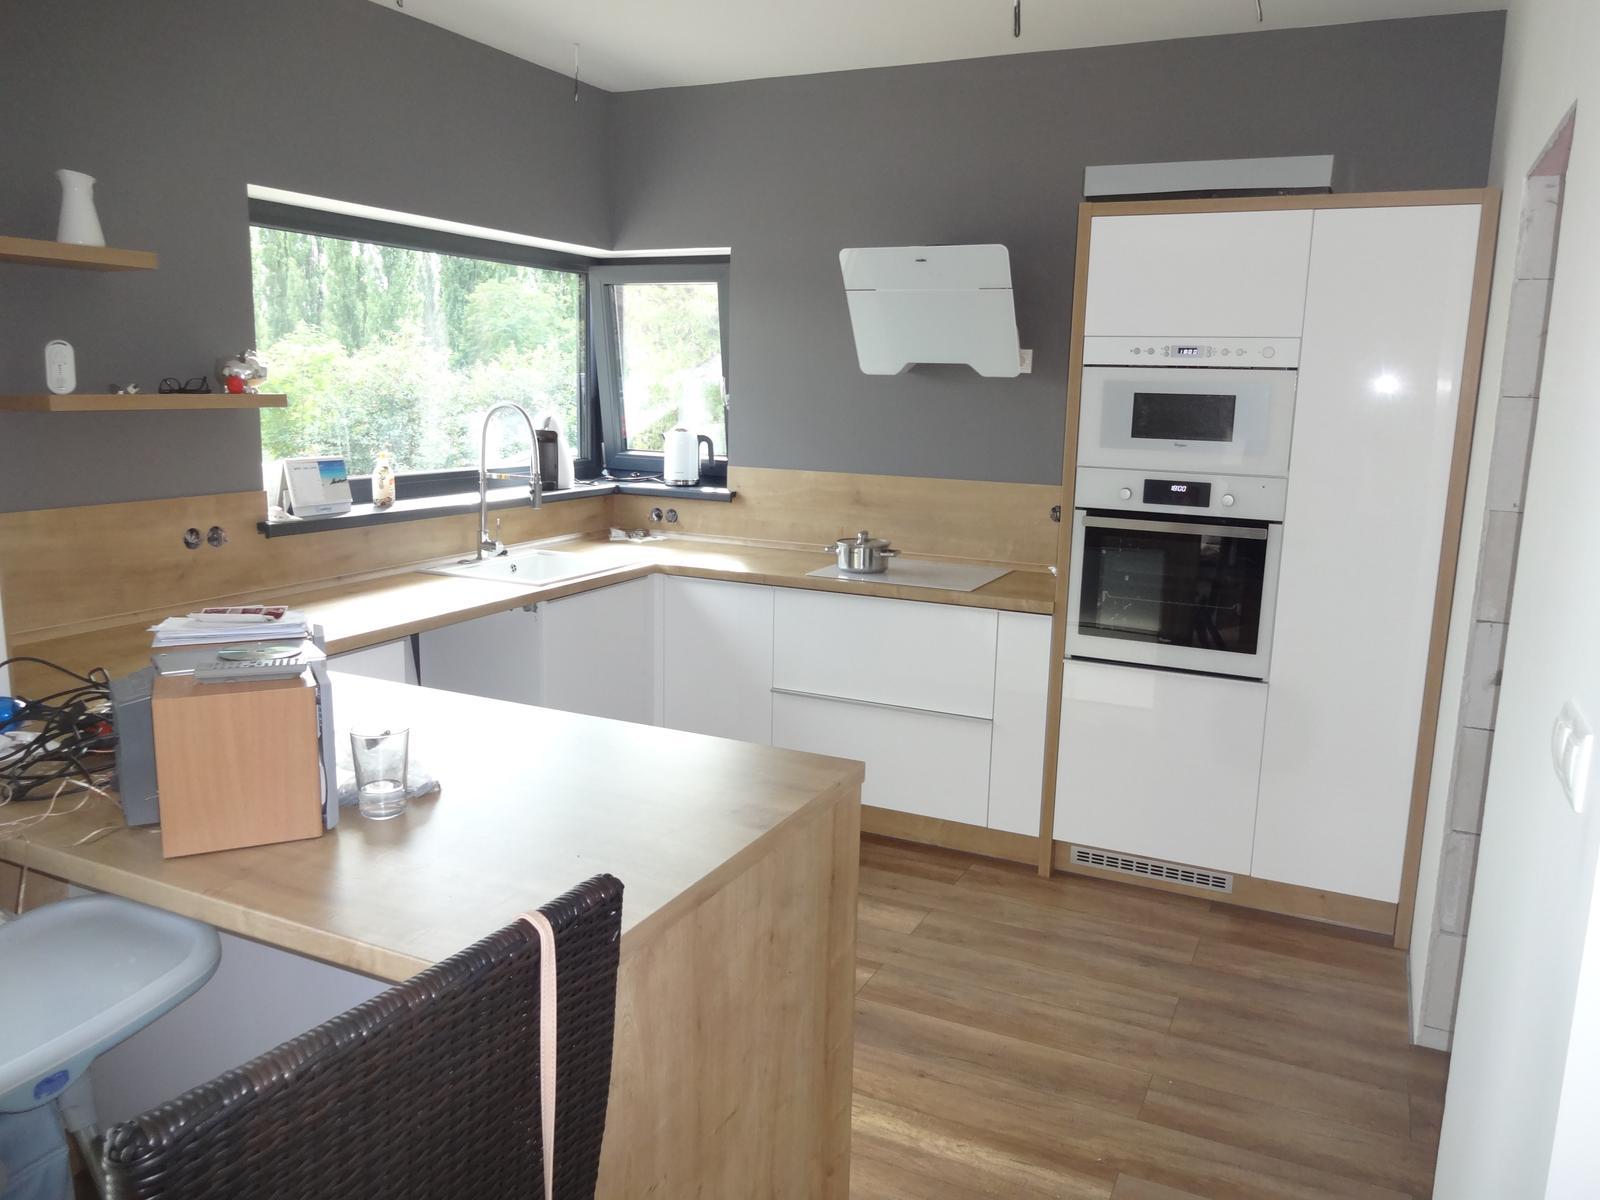 Kuchyne - Kuchyňa dub arlington / biela lesklá striekaná